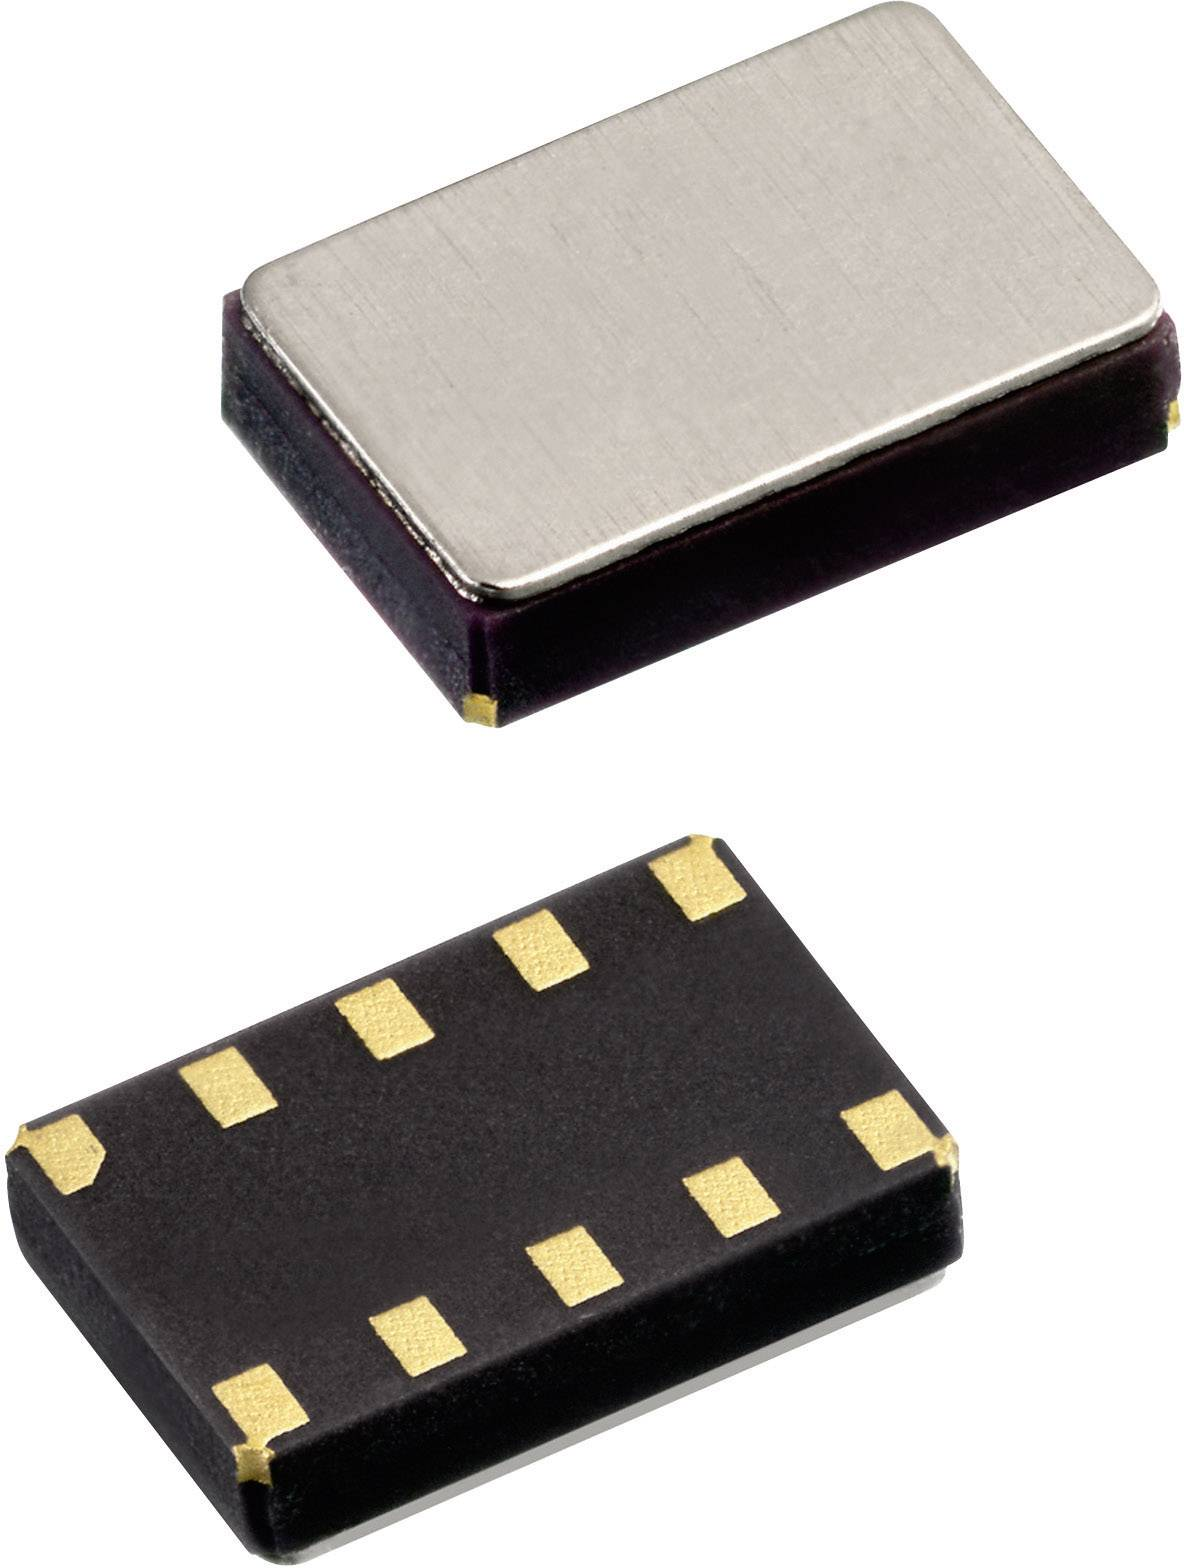 SMD krystal MicroCrystal, RV-3029-C3-TA Option B